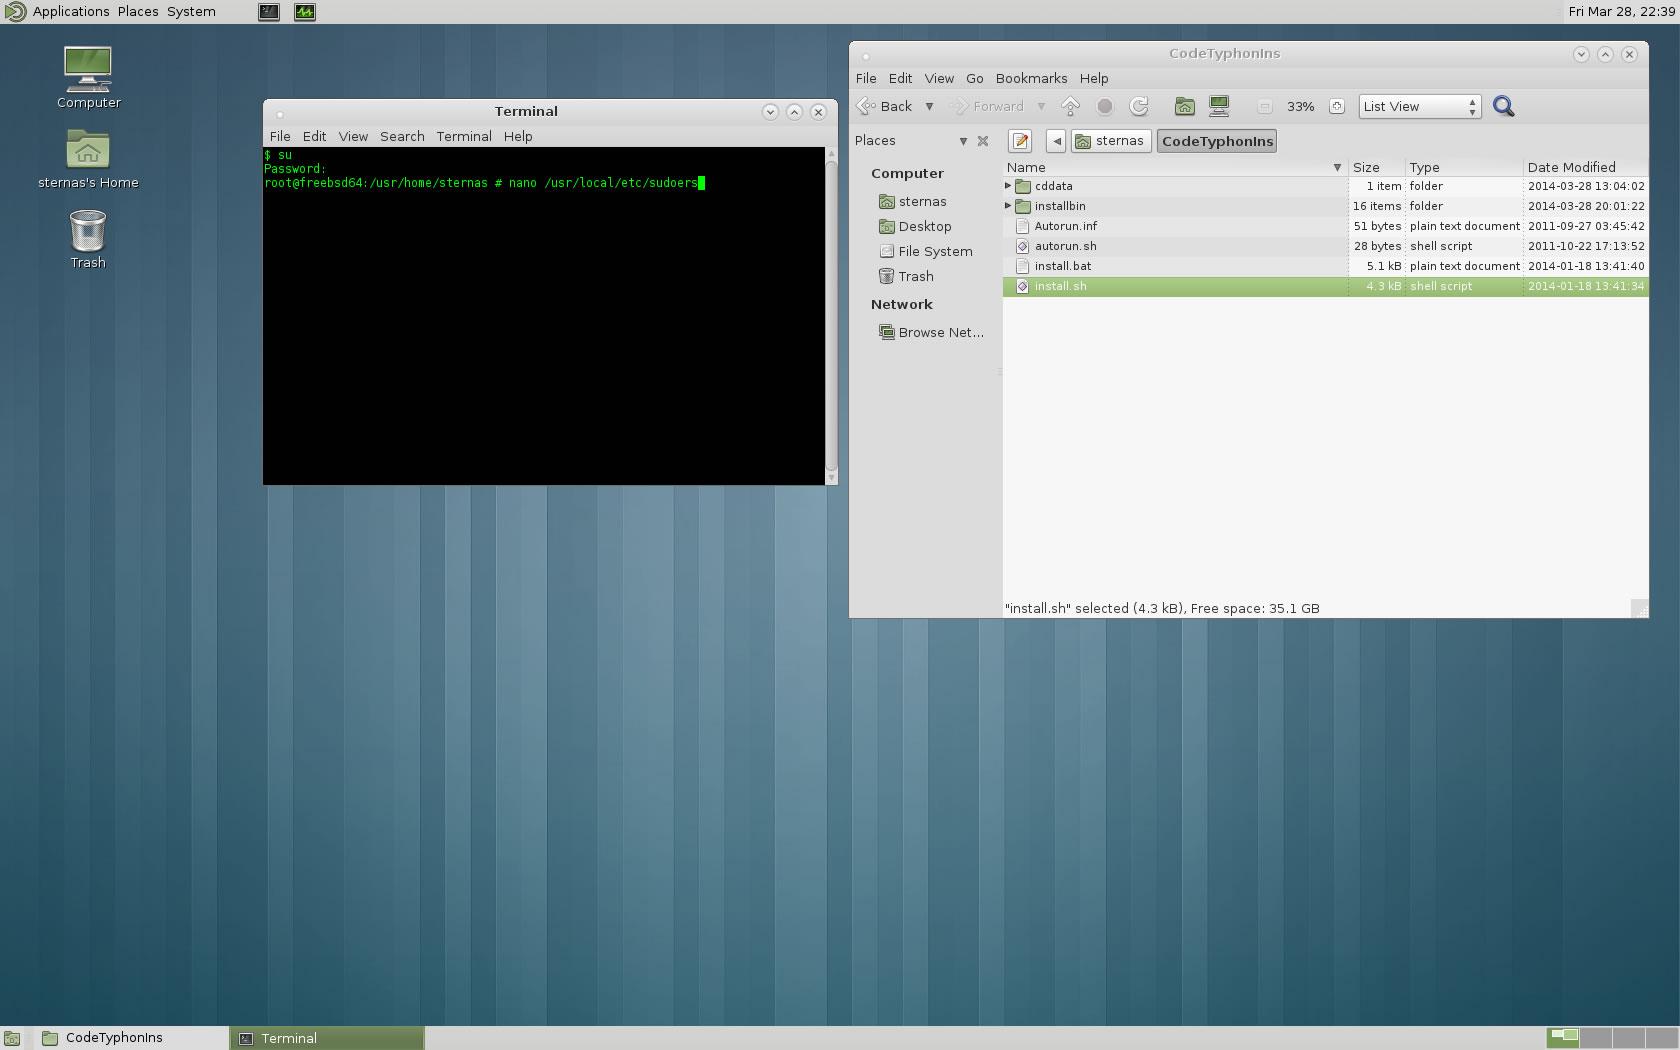 FreeBSD10-64-2.jpg